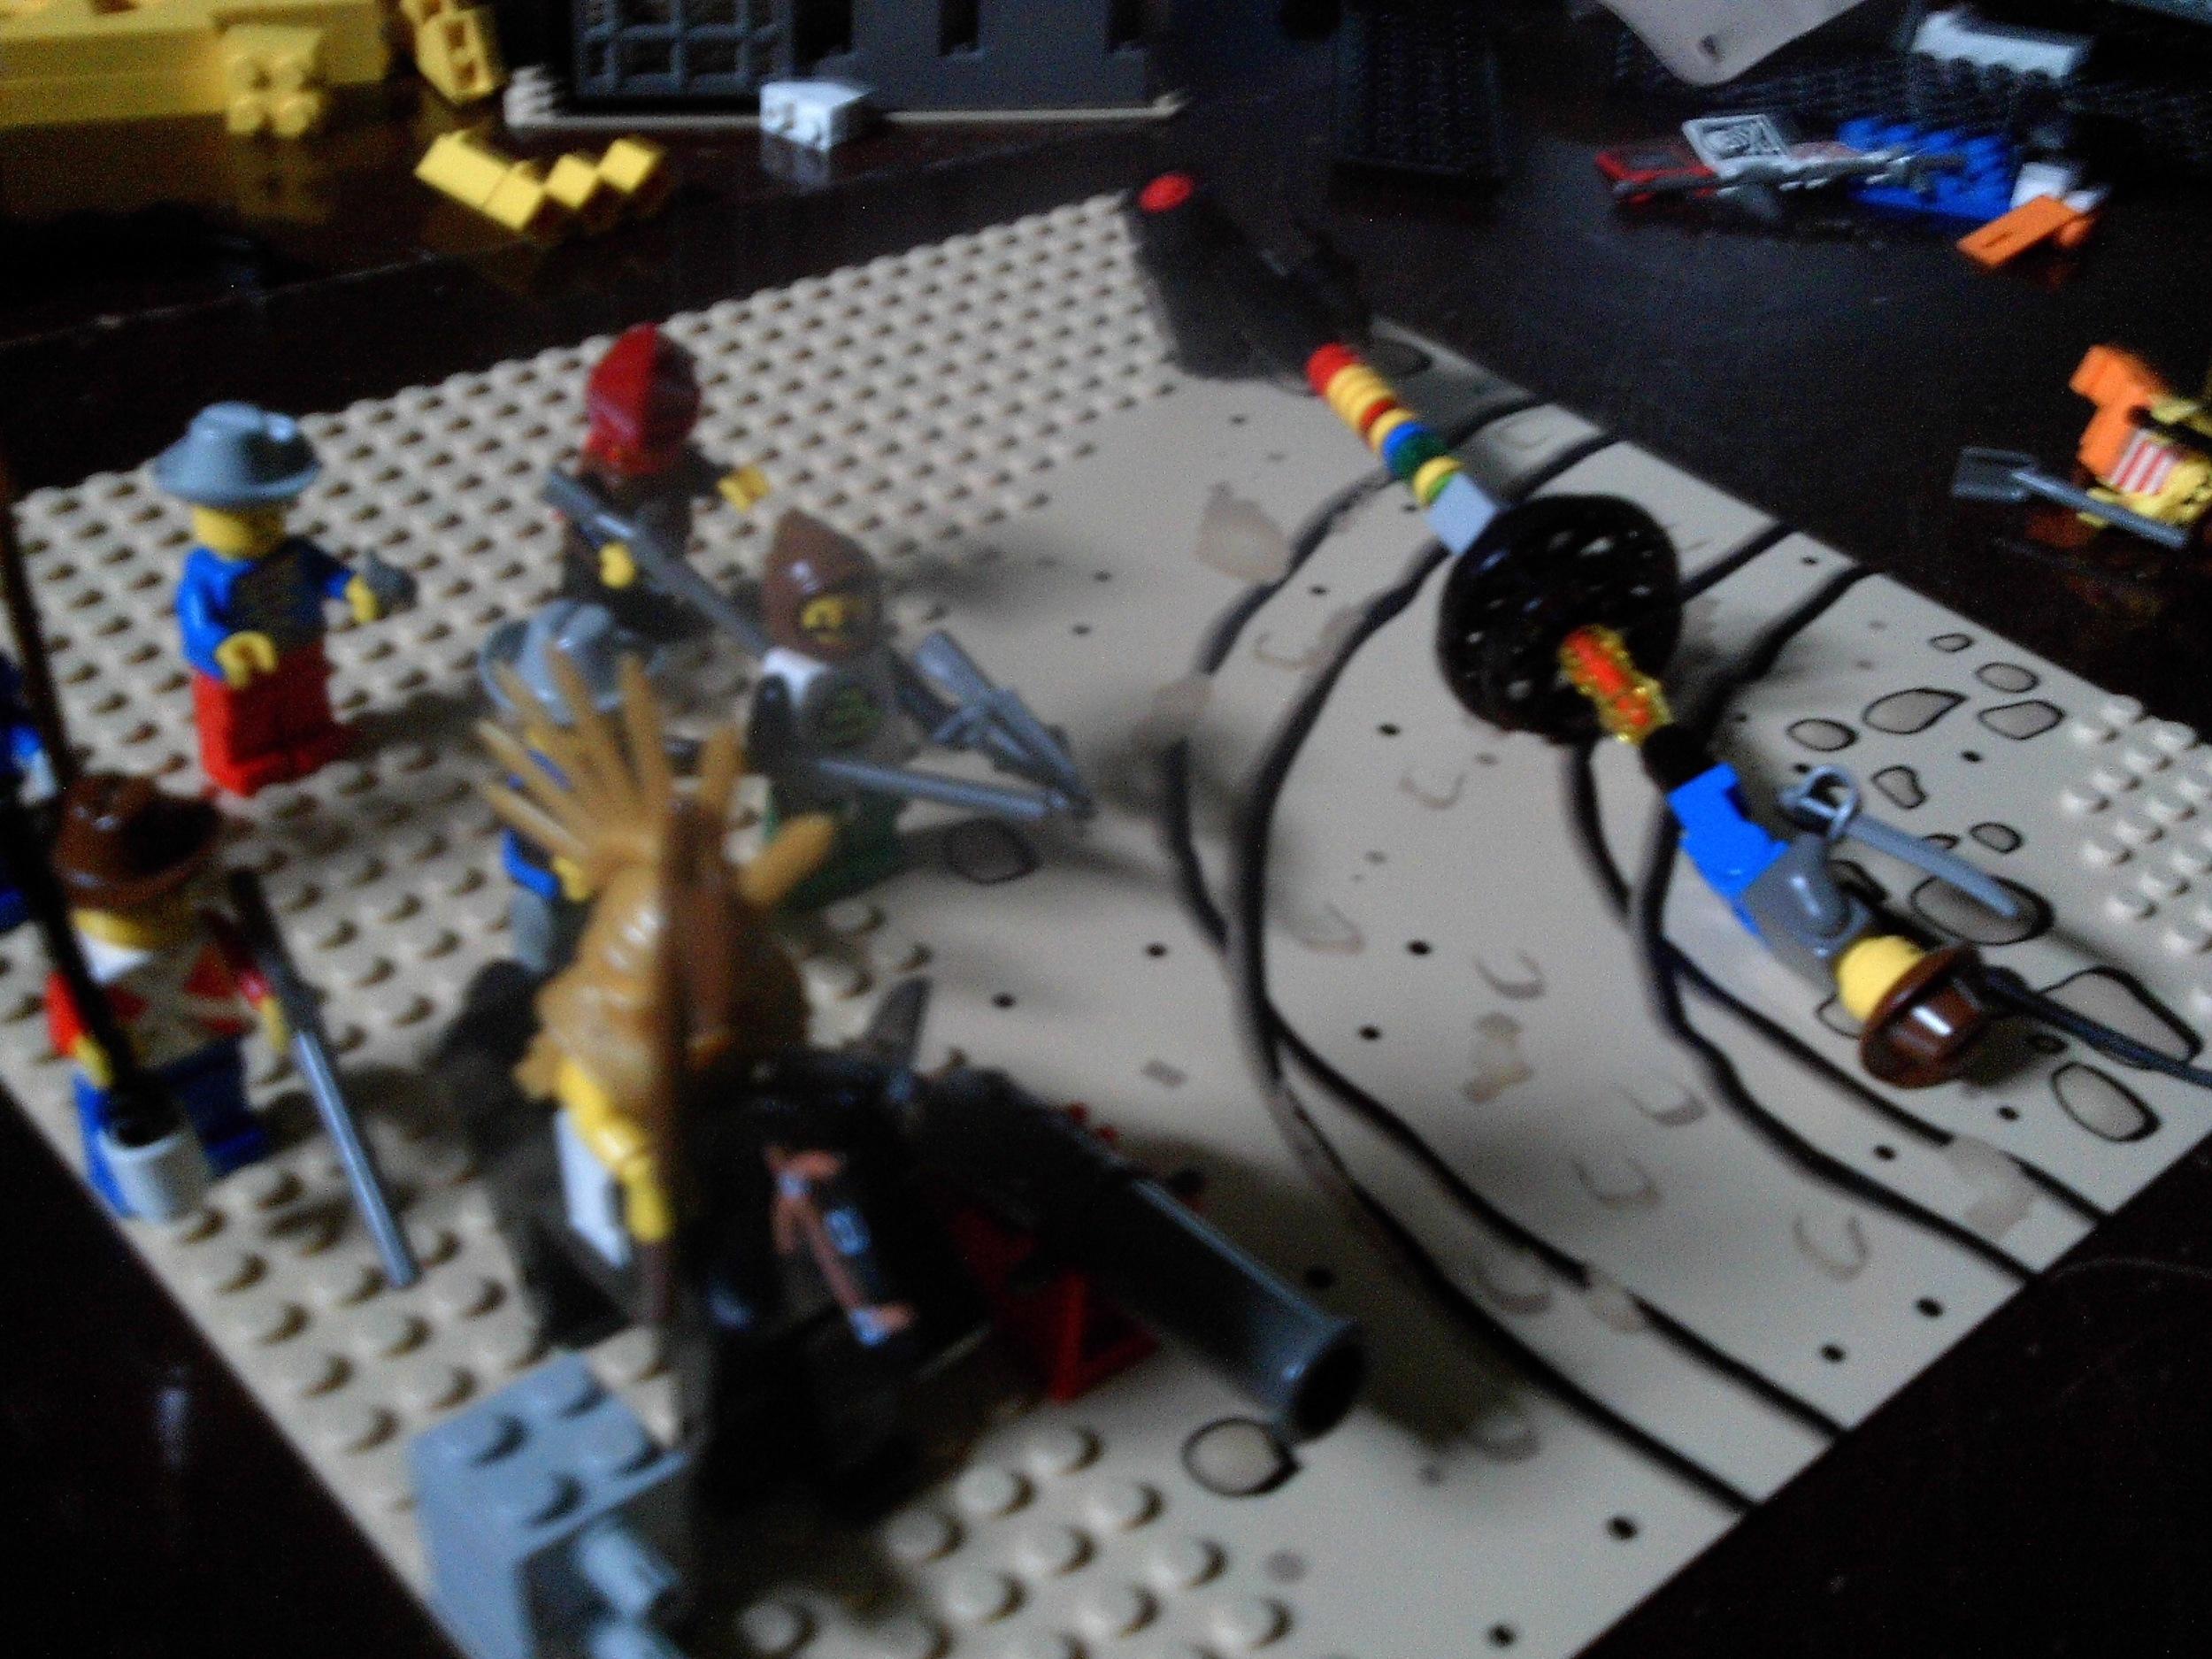 M: Lego guys